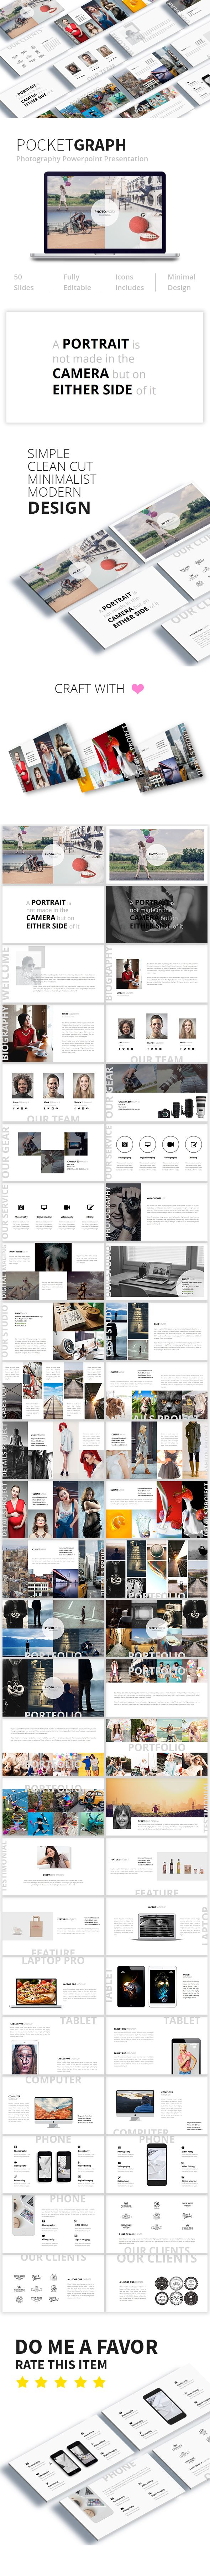 Pocketgraph Photography Powerpoint Presentation #presentation #powerpoint • Download ➝ https://graphicriver.net/item/pocketgraph-photography-powerpoint-presentation/18089131?ref=pxcr